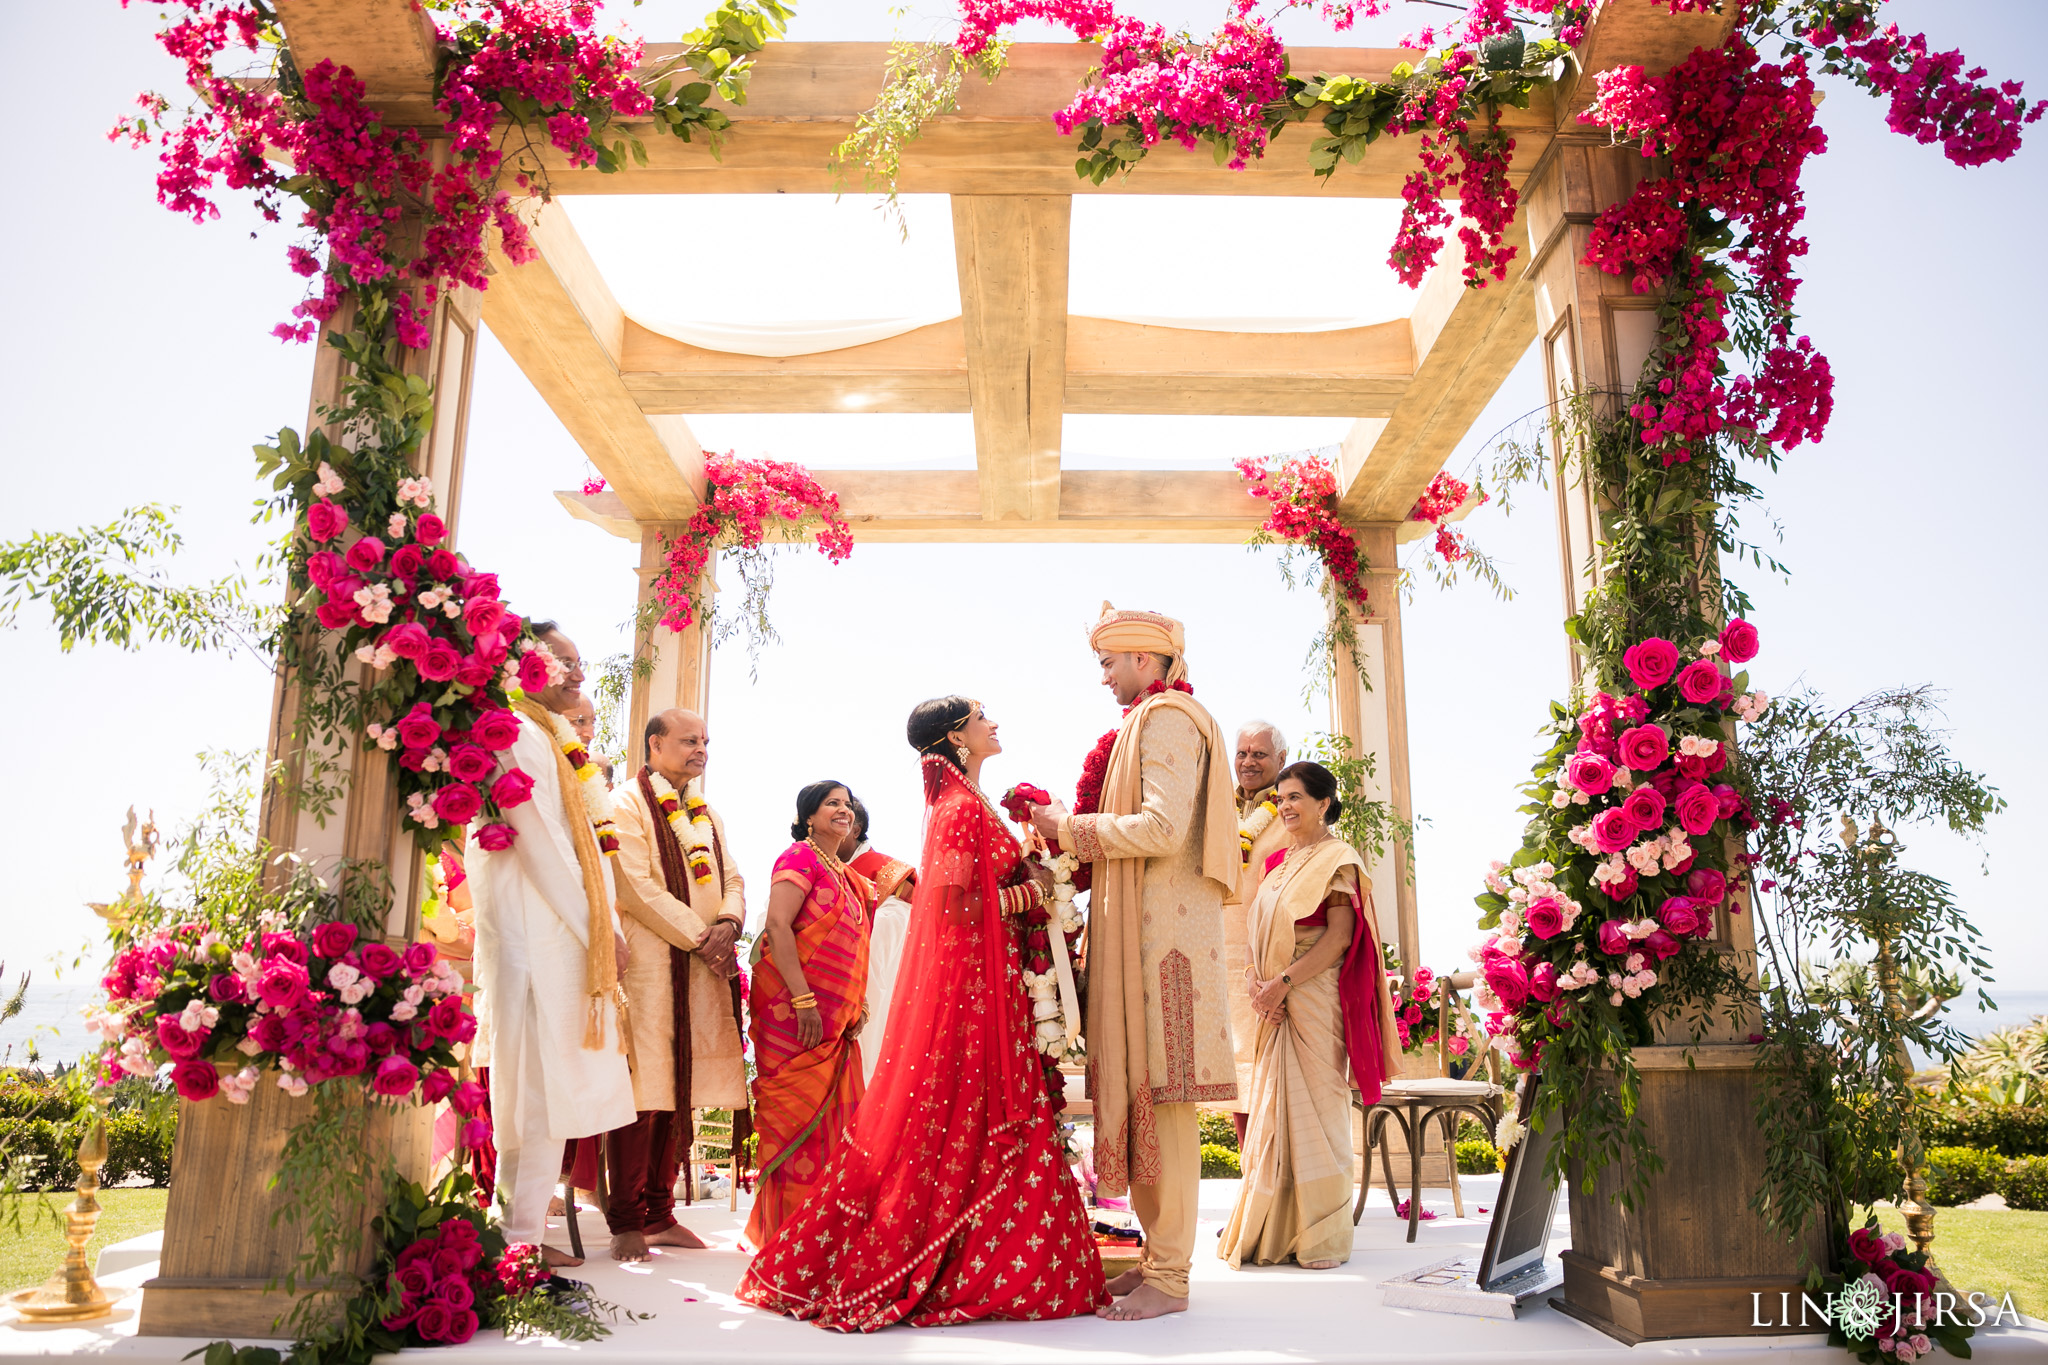 22-montage-laguna-beach-indian-wedding-photography.jpg